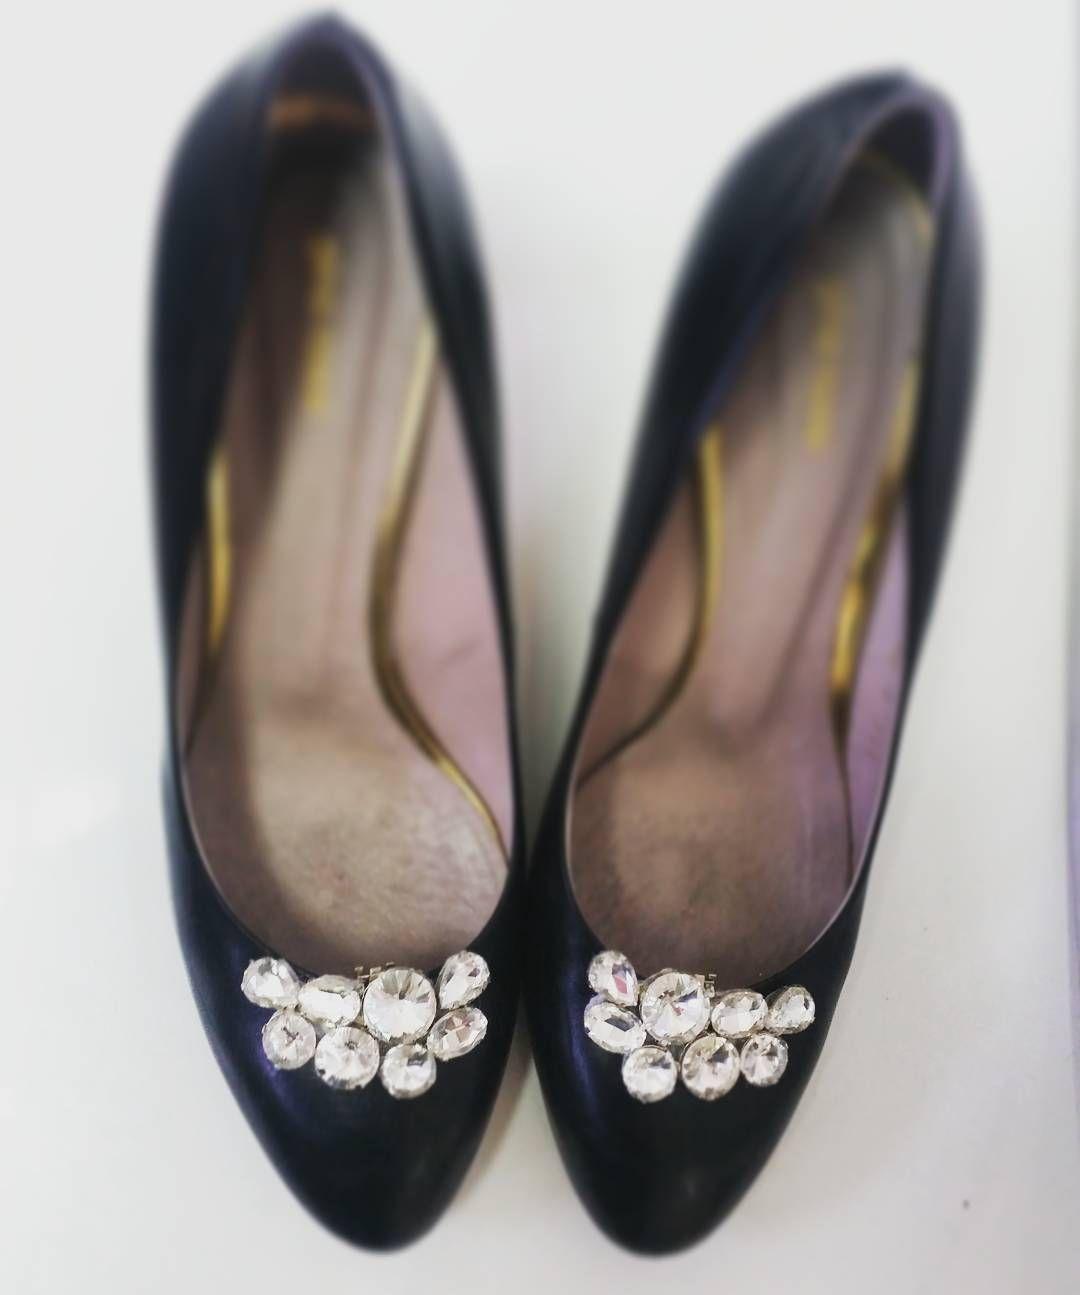 Seastar Wiosenne Baleriny Rozowe Shoes Fashion Flats